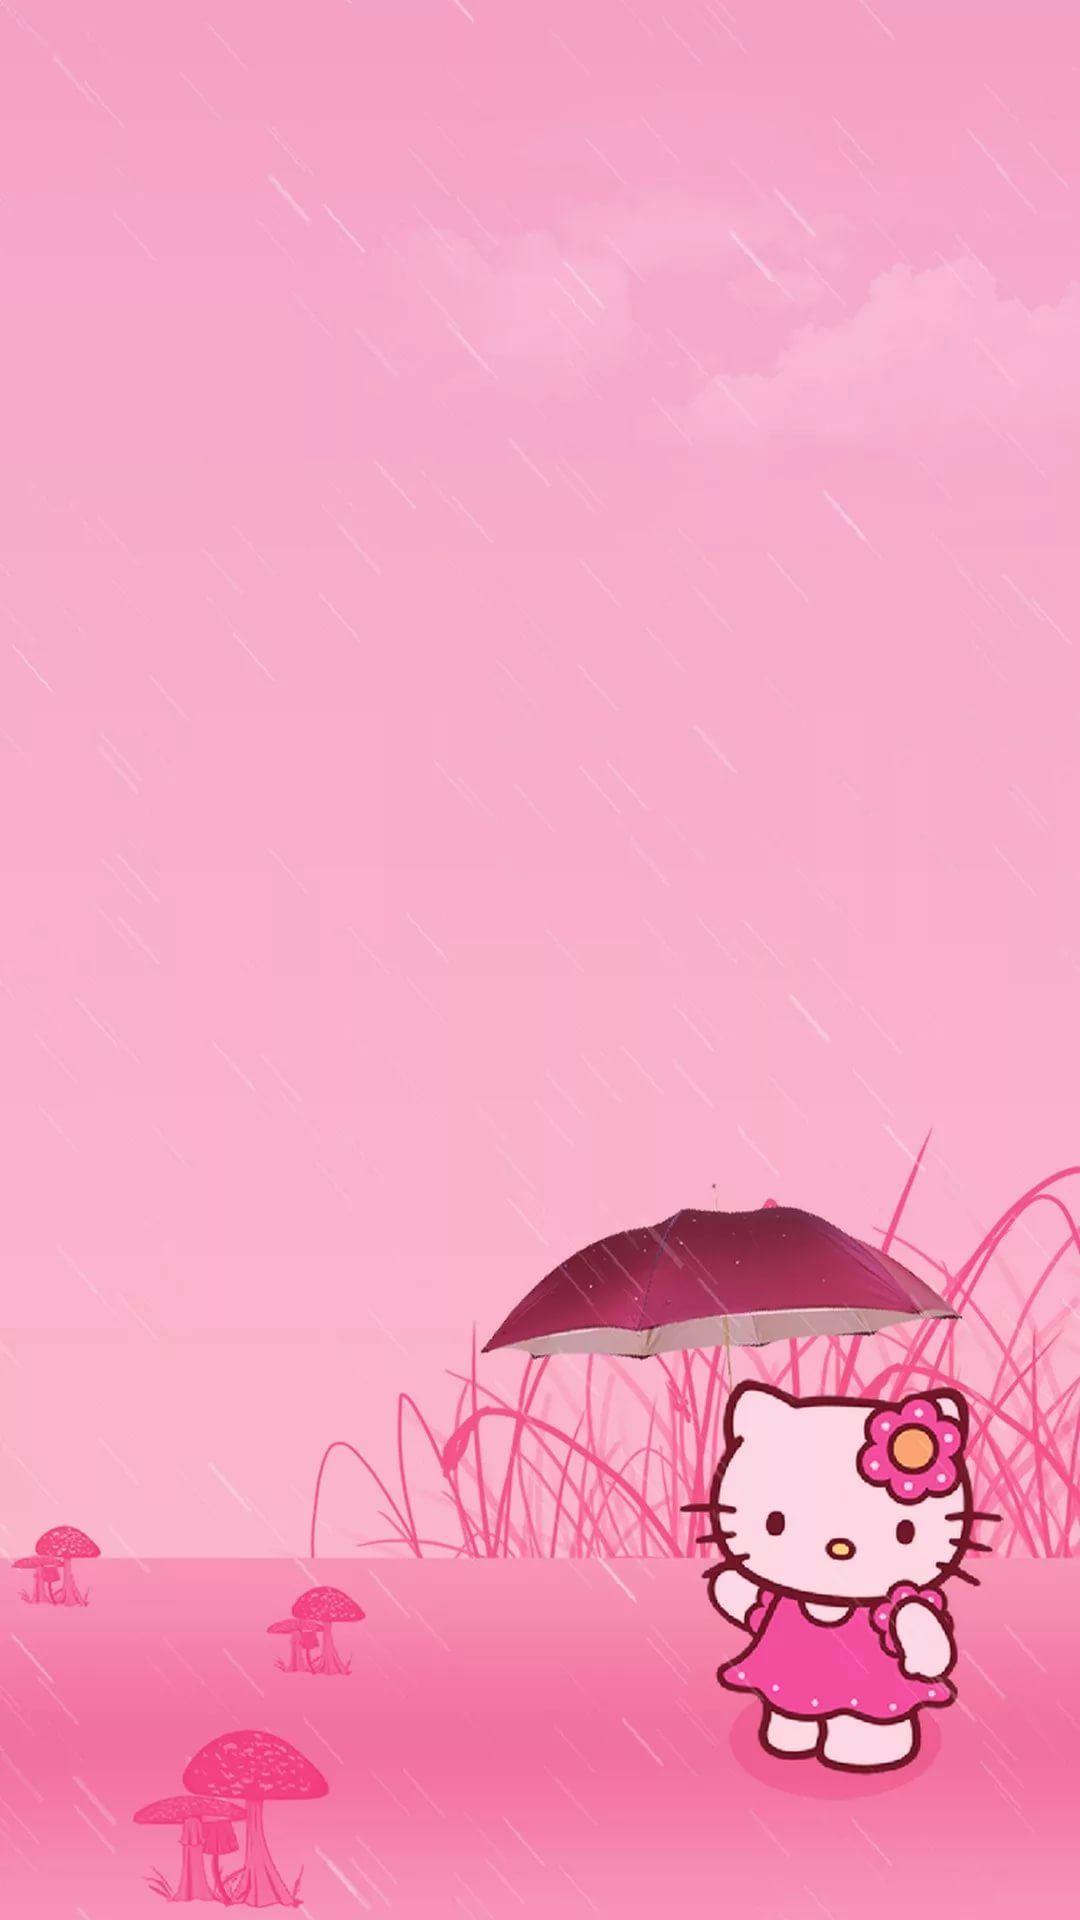 Hello Kitty phone wallpaper